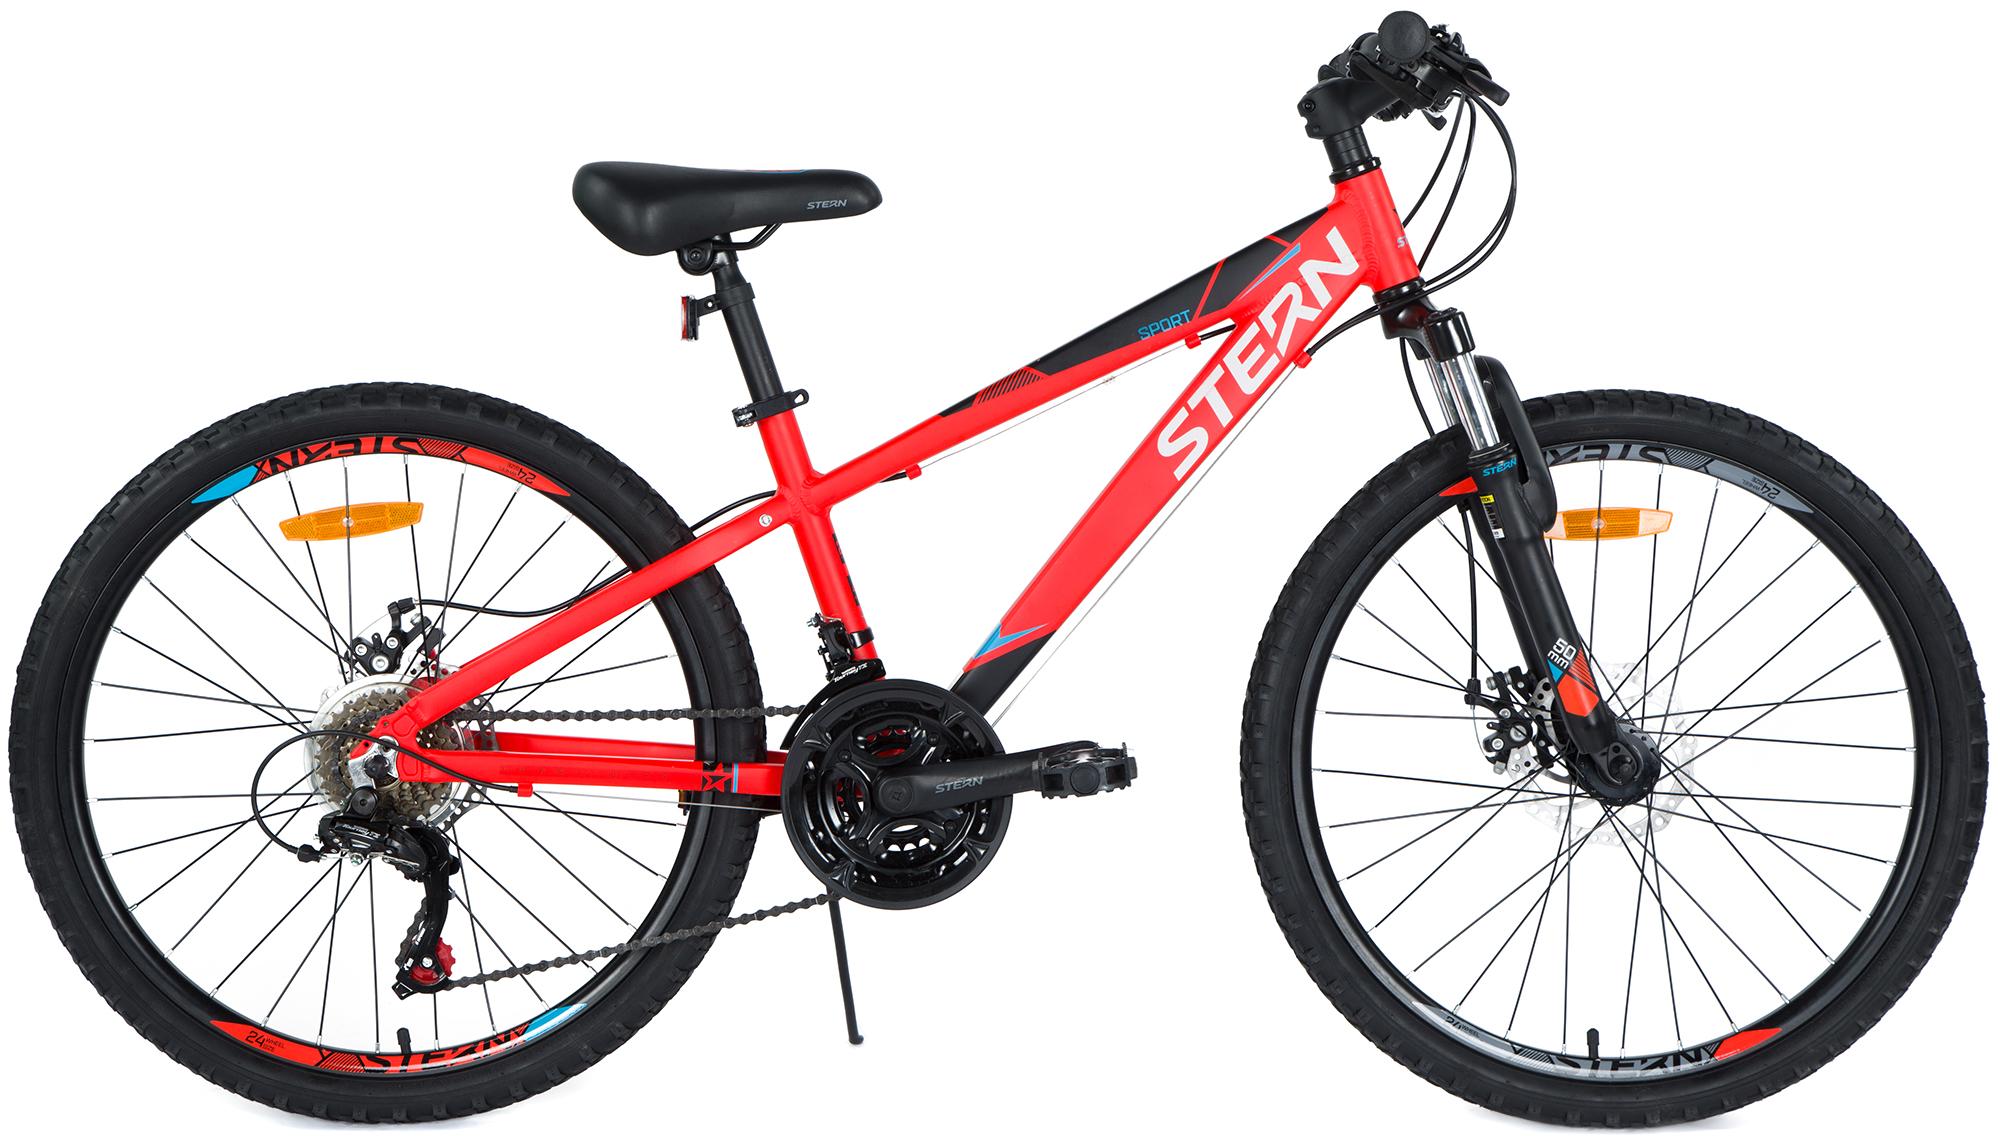 Stern Велосипед подростковый Stern Attack Sport 24 цена